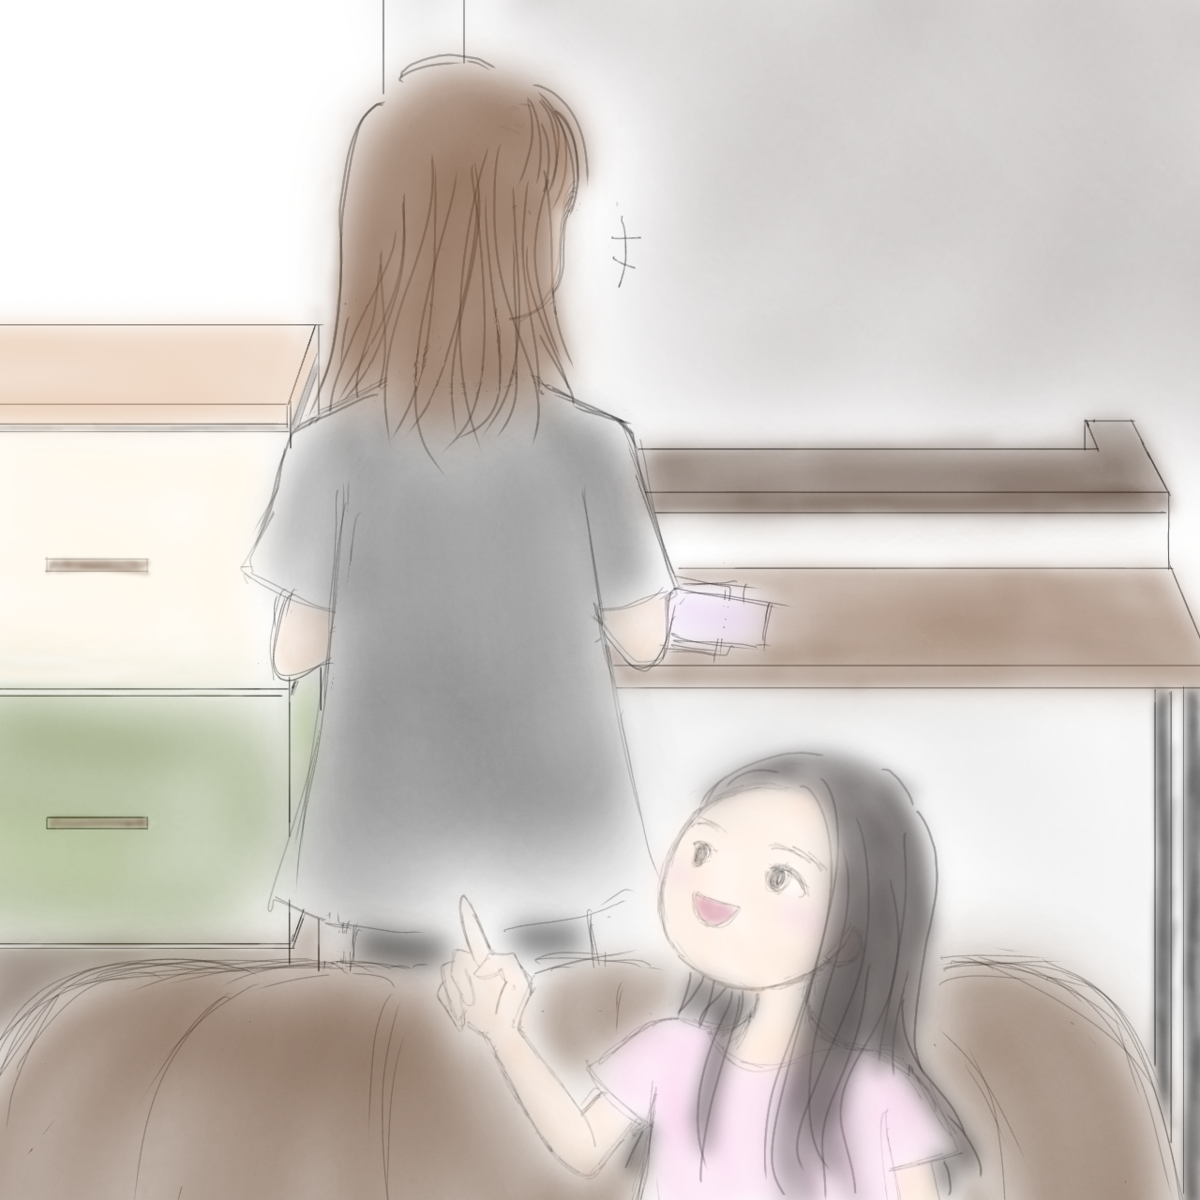 f:id:garasunomichi:20210623222709p:plain